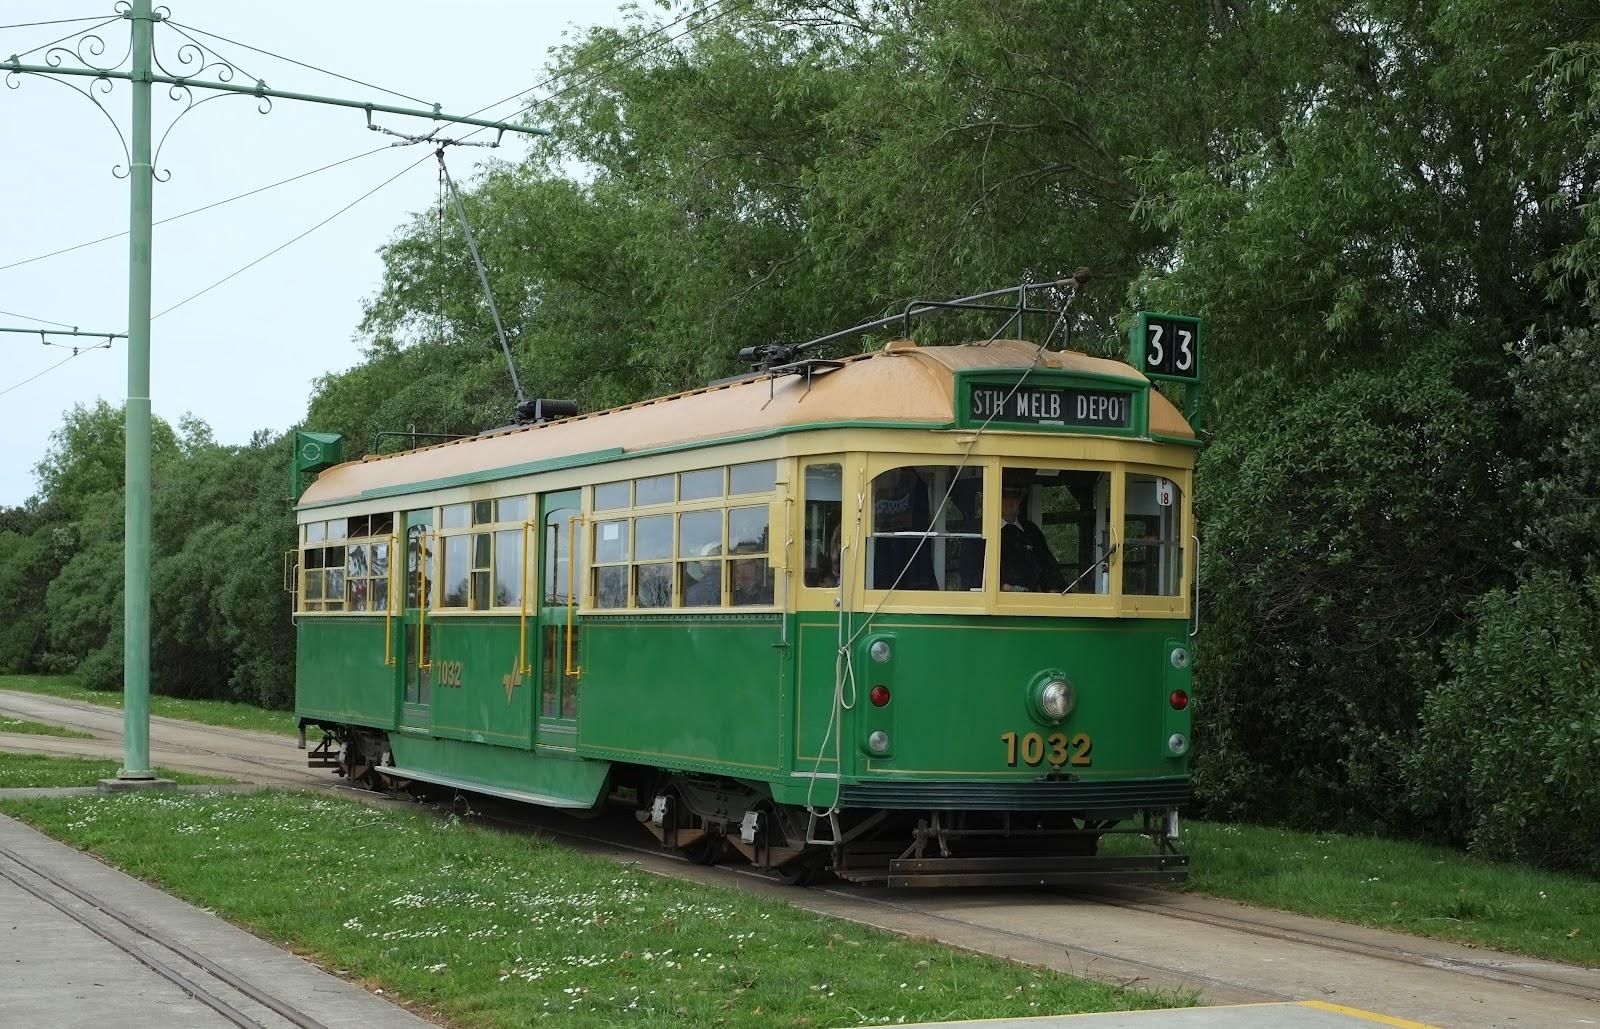 File:Tram between MOTAT sites. ...